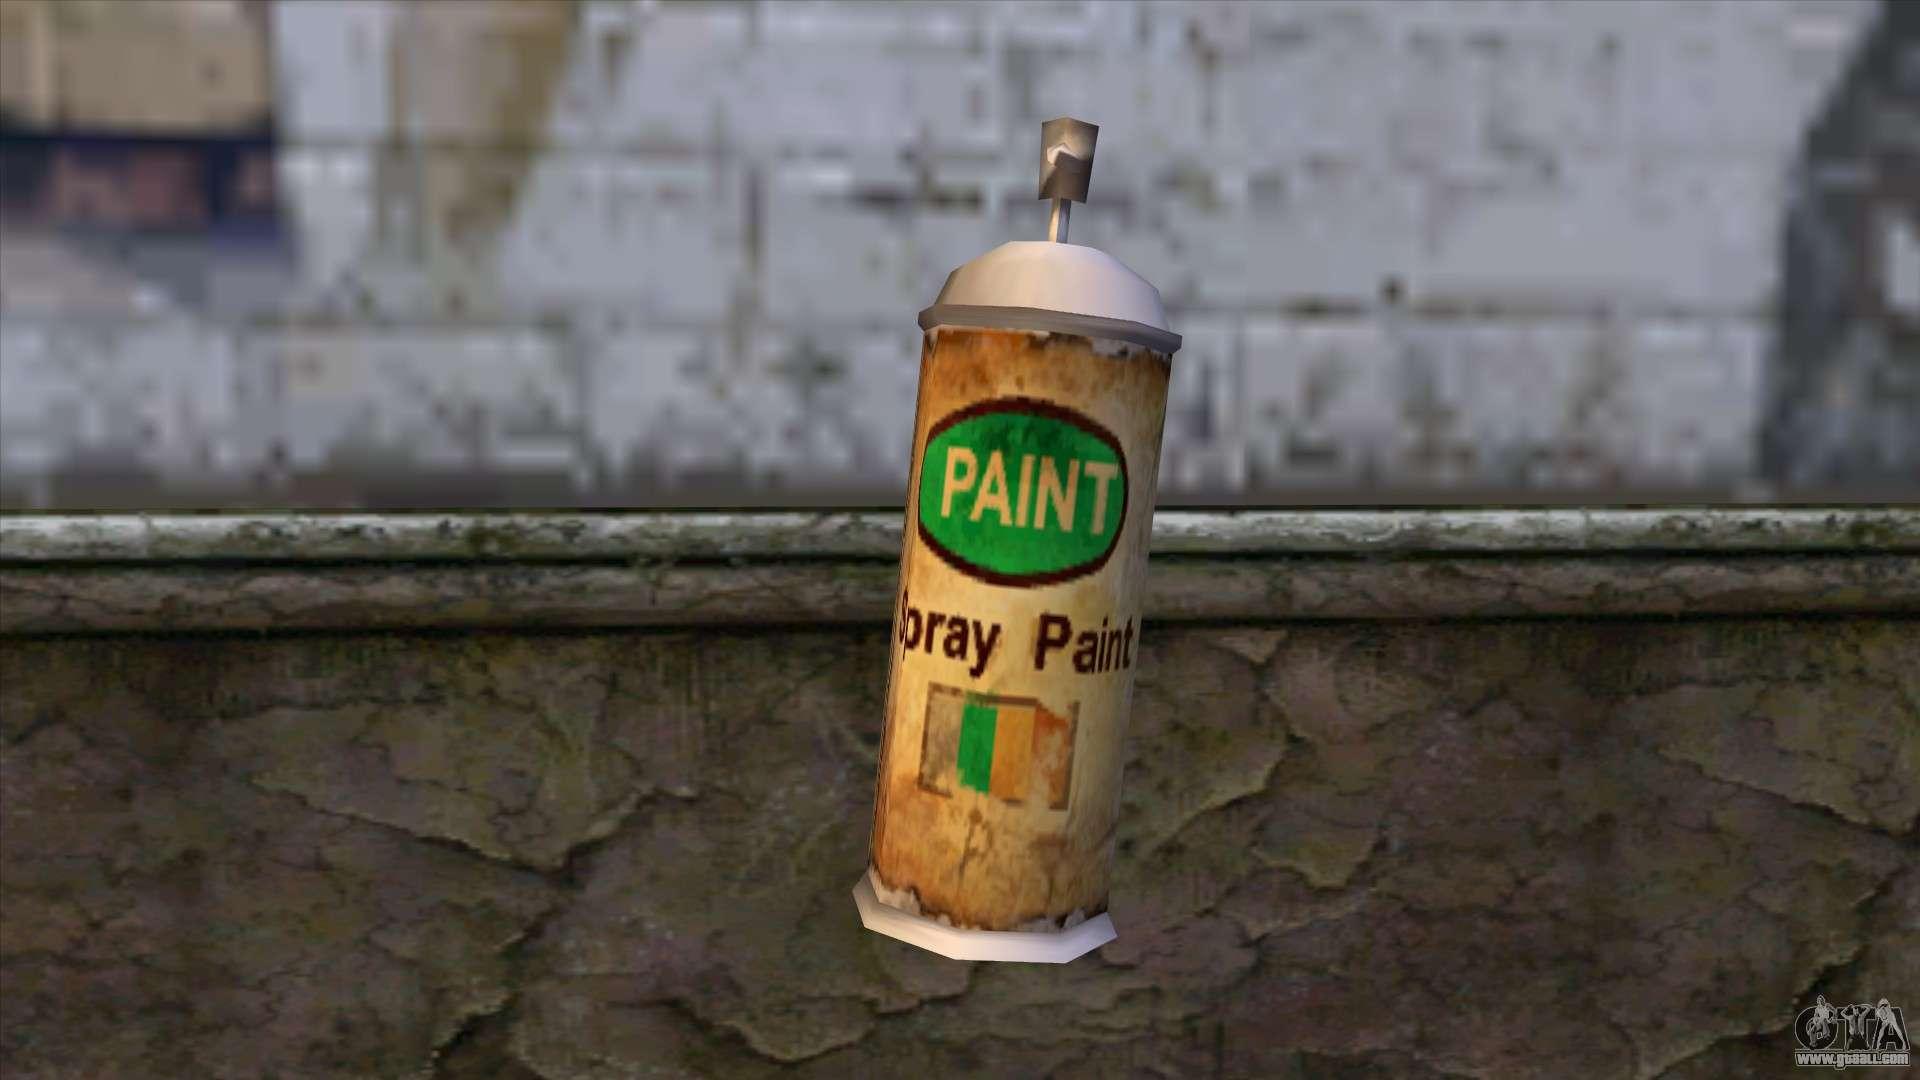 SpraycansFromBullyScholarshipEditionForGtaSanAndreas